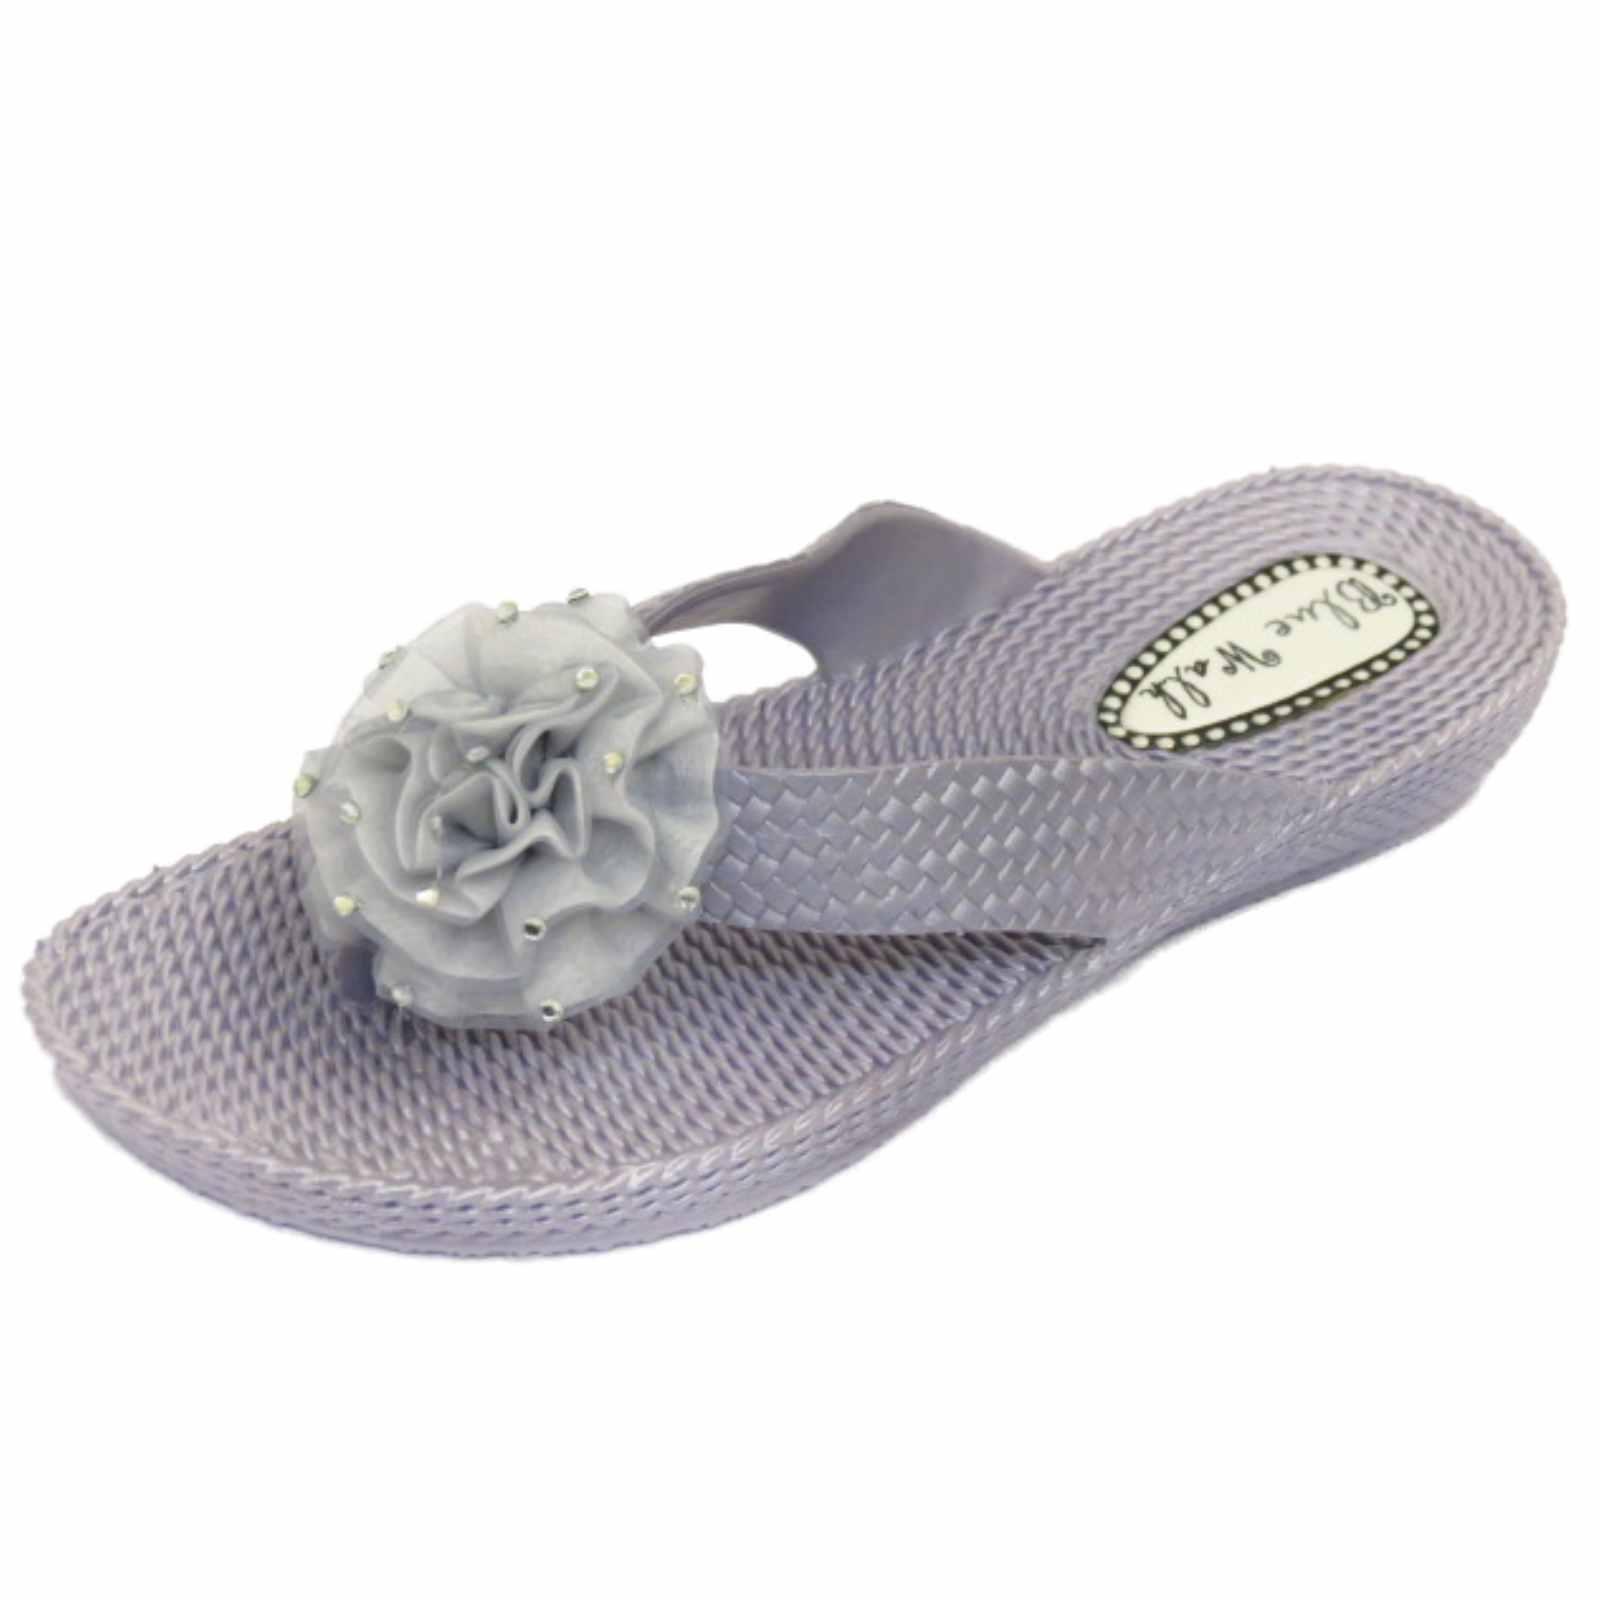 mujer plano plata con Tira Chanclas Chanclas Playa Flor Plataforma Zapatos 3-8